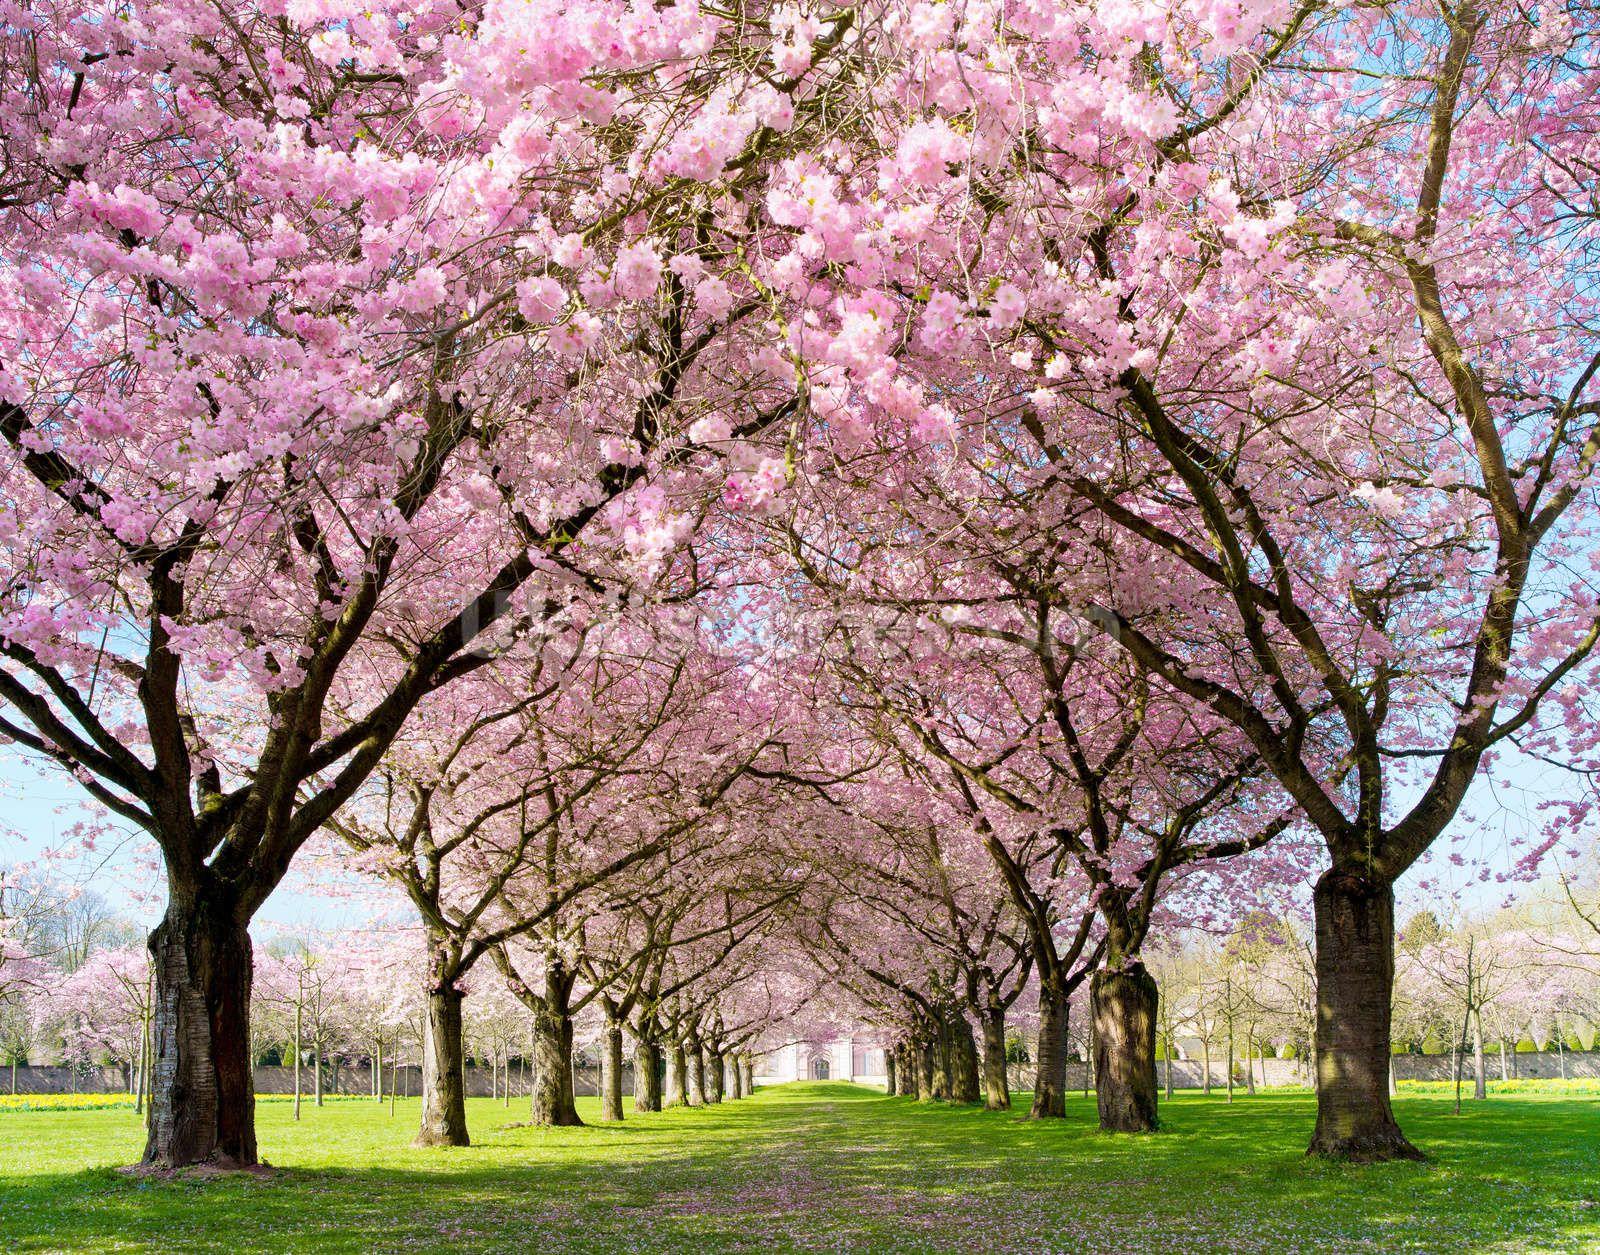 Cherry Blossom Trees Wall Mural Wallpaper Wallsauce Us Blossom Trees Tree Wall Murals Cherry Blossom Tree